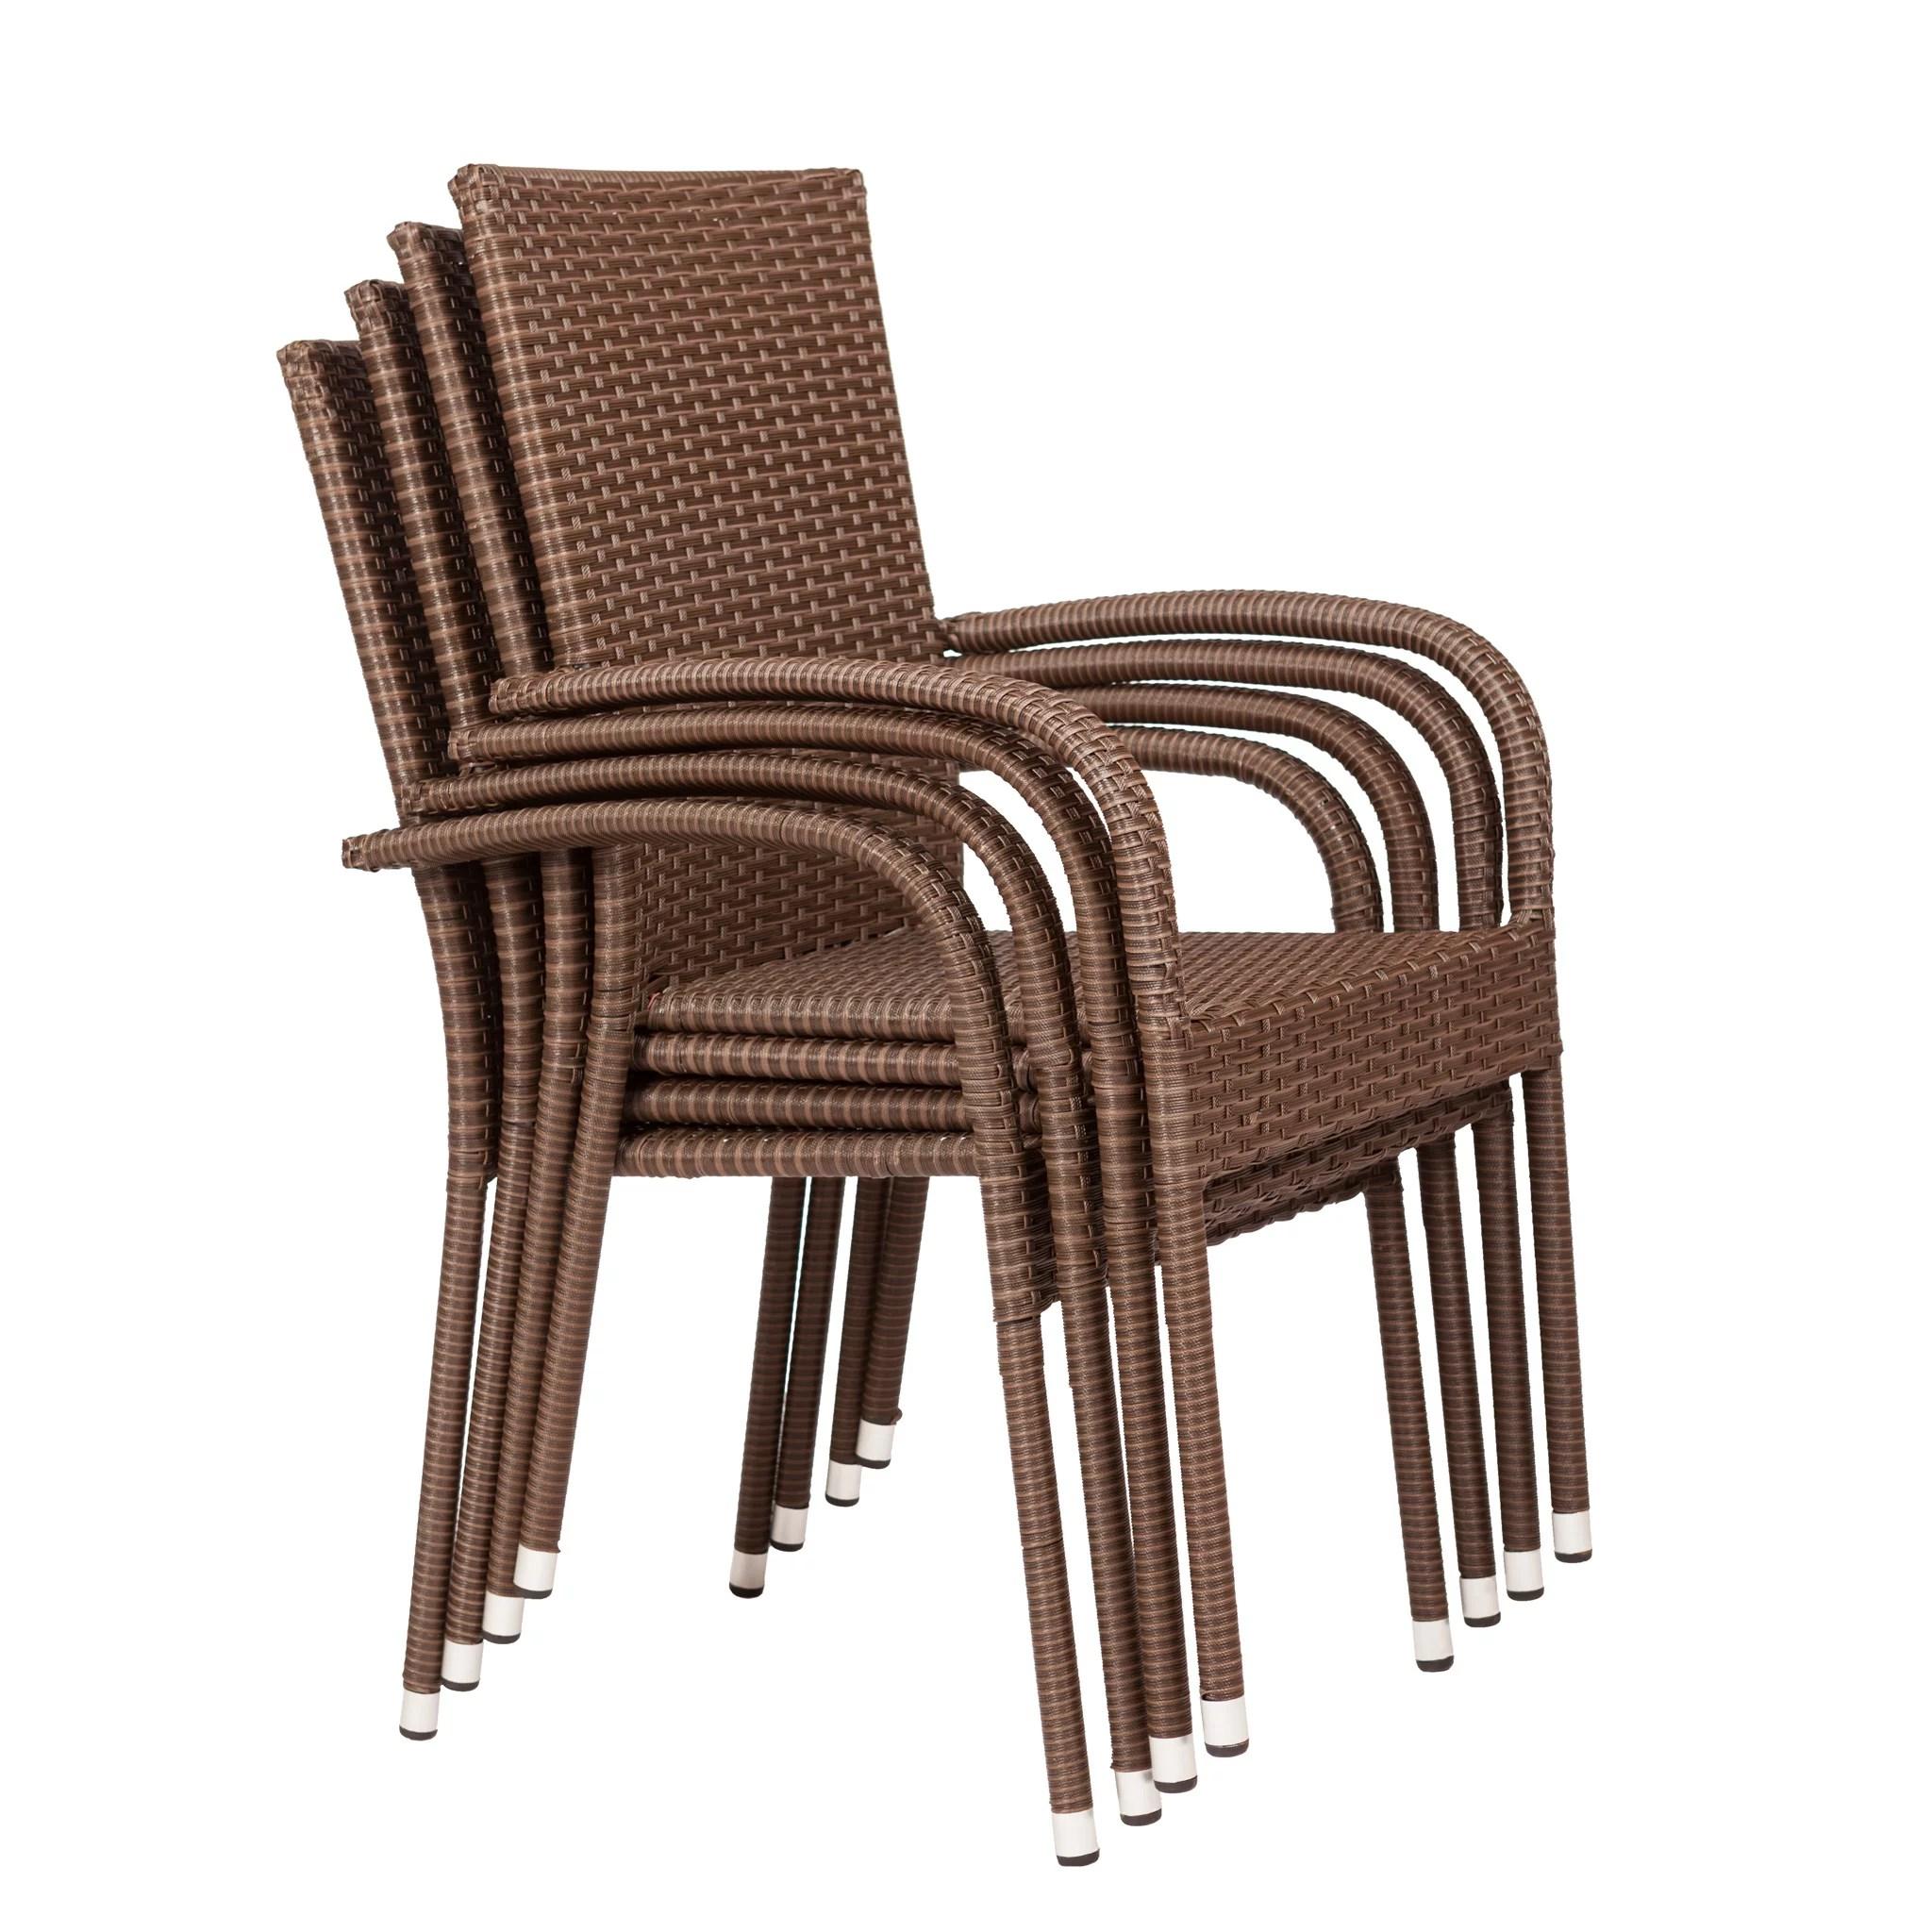 balkene home morgan resin wicker stacking patio dining chair 4 pack in mocha walmart com